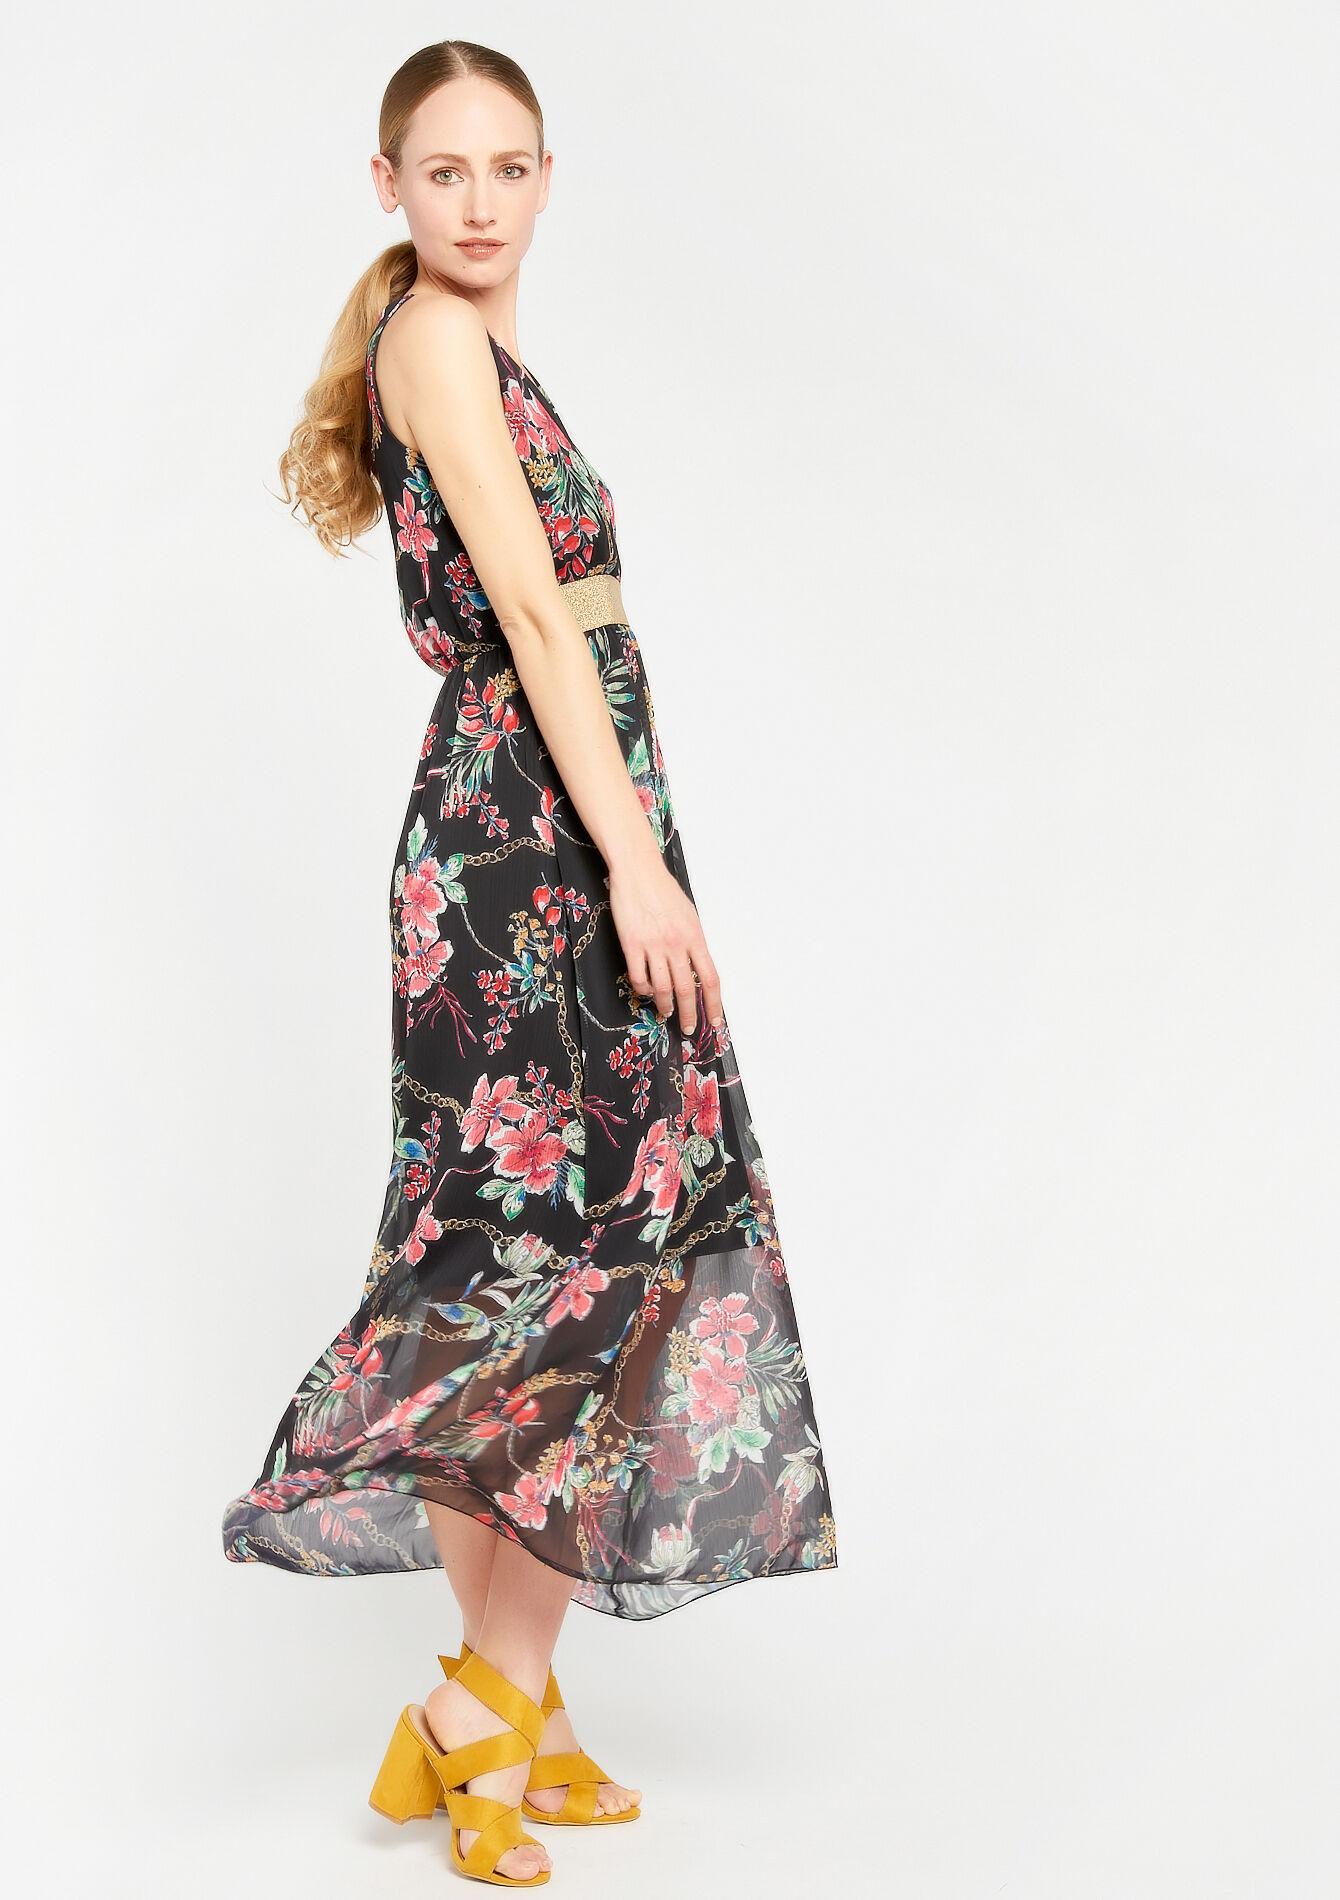 a39080f76e3e71 Maxi jurken met lange mouwen bestellen